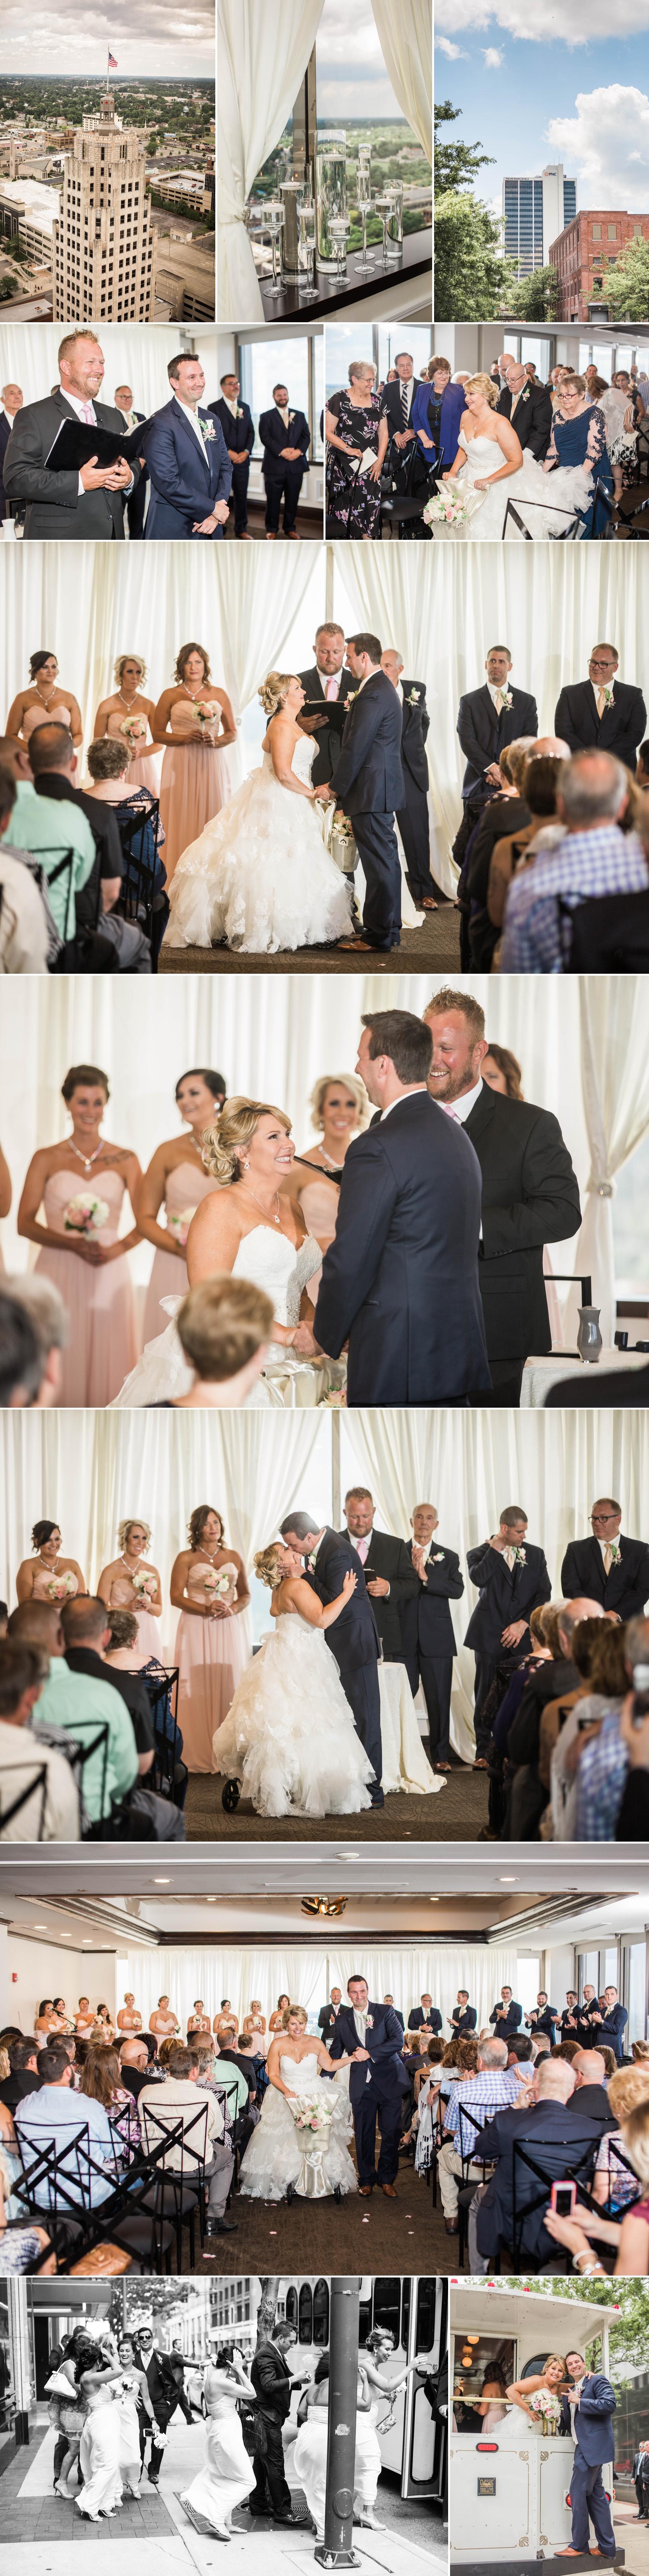 wedding day-wedding-getting ready-bride-details-wedding dress-love-downtown-fort wayne-wedding party-ceremony-empyrean